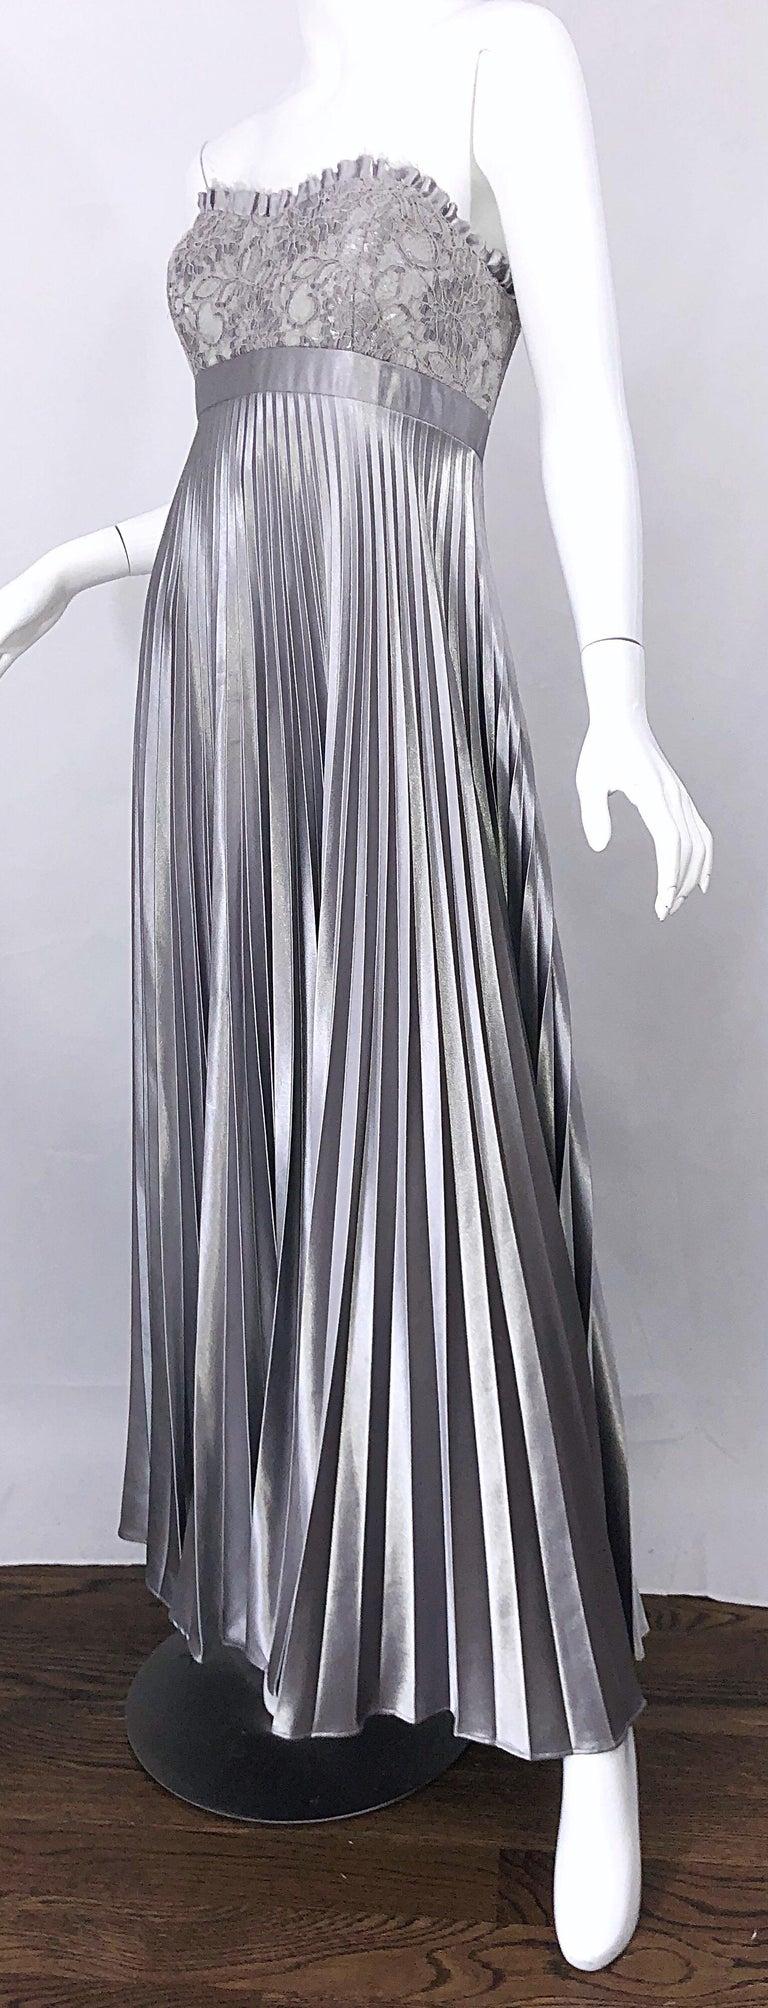 Beautiful Vintage Badgley Mischka Size 10 / 12 Silver Metallic Beaded Gown Dress For Sale 6